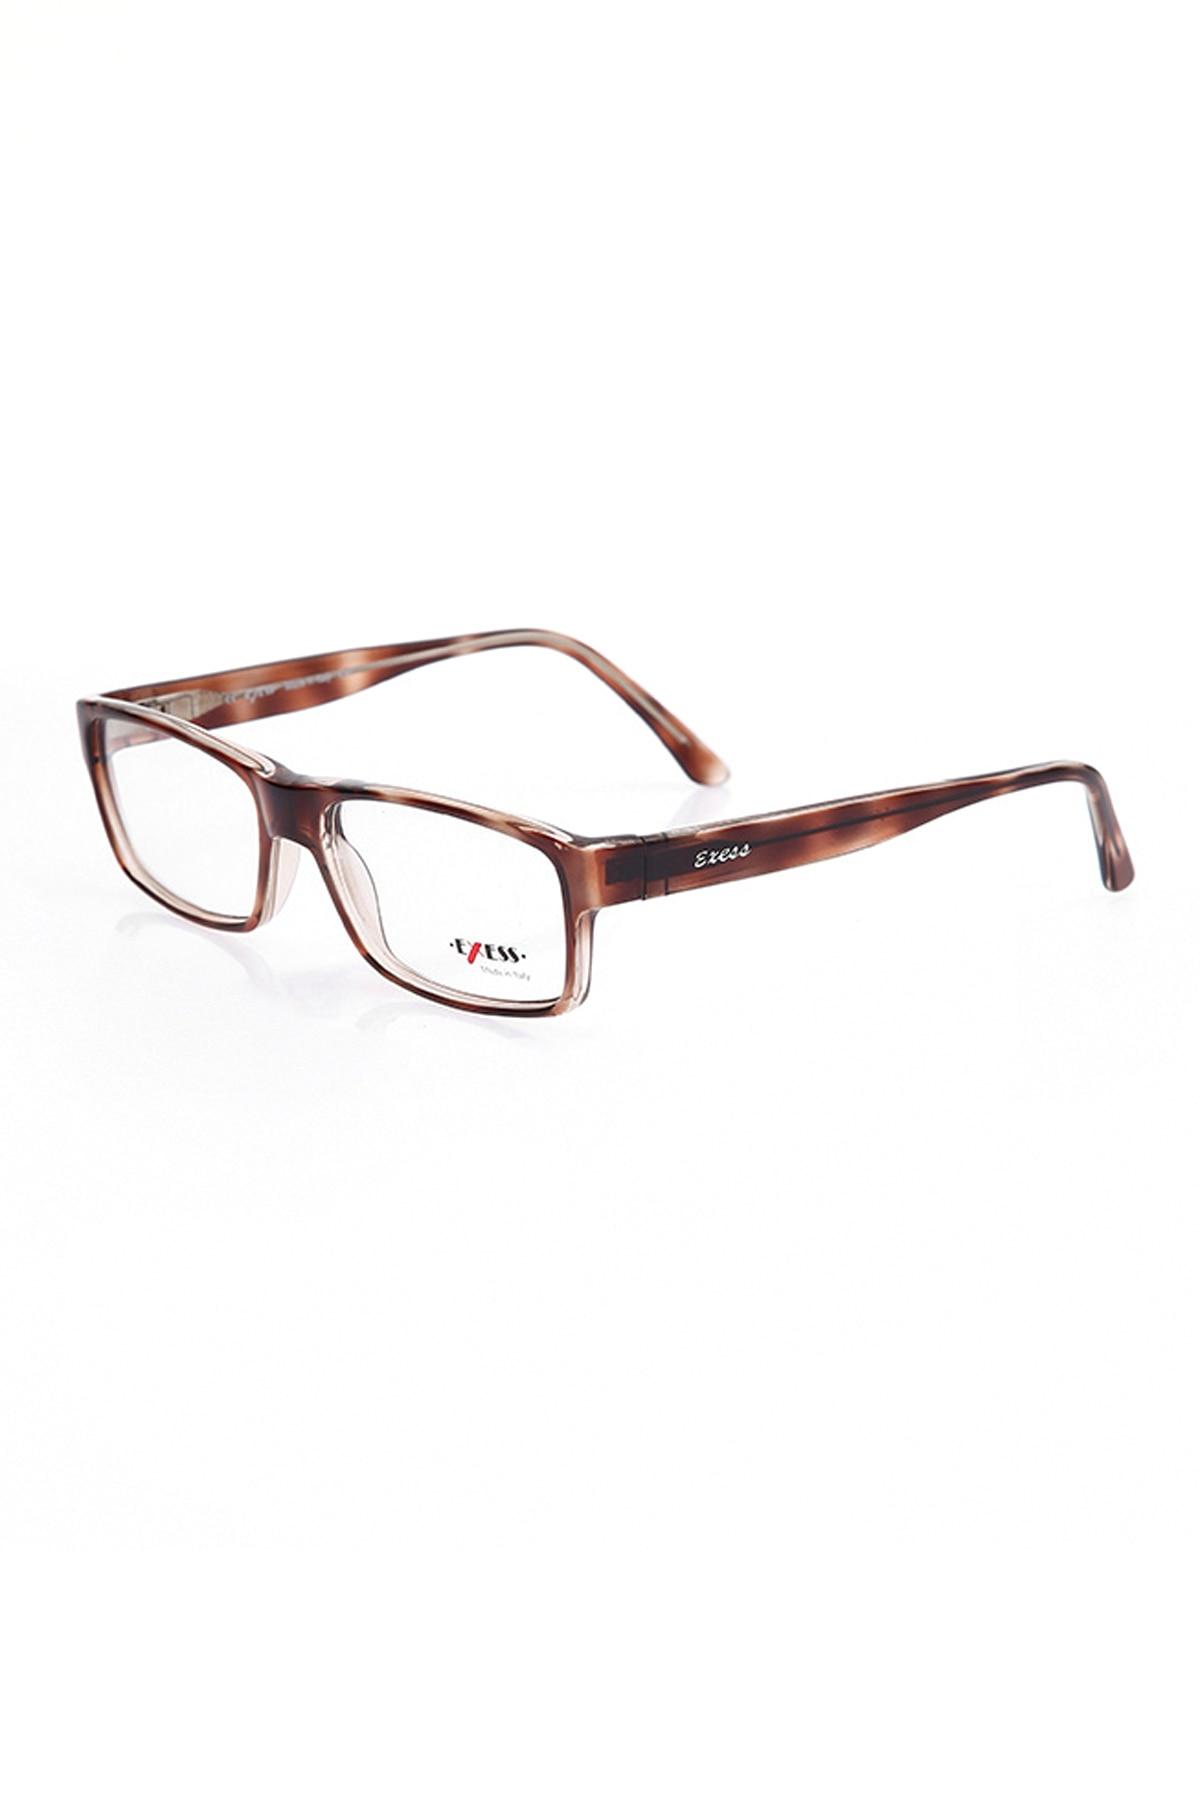 Markamilla Men Reading Glasses Frame Demo Glasses Eyewear Transparent High Quality MenExess E 237 7085 57